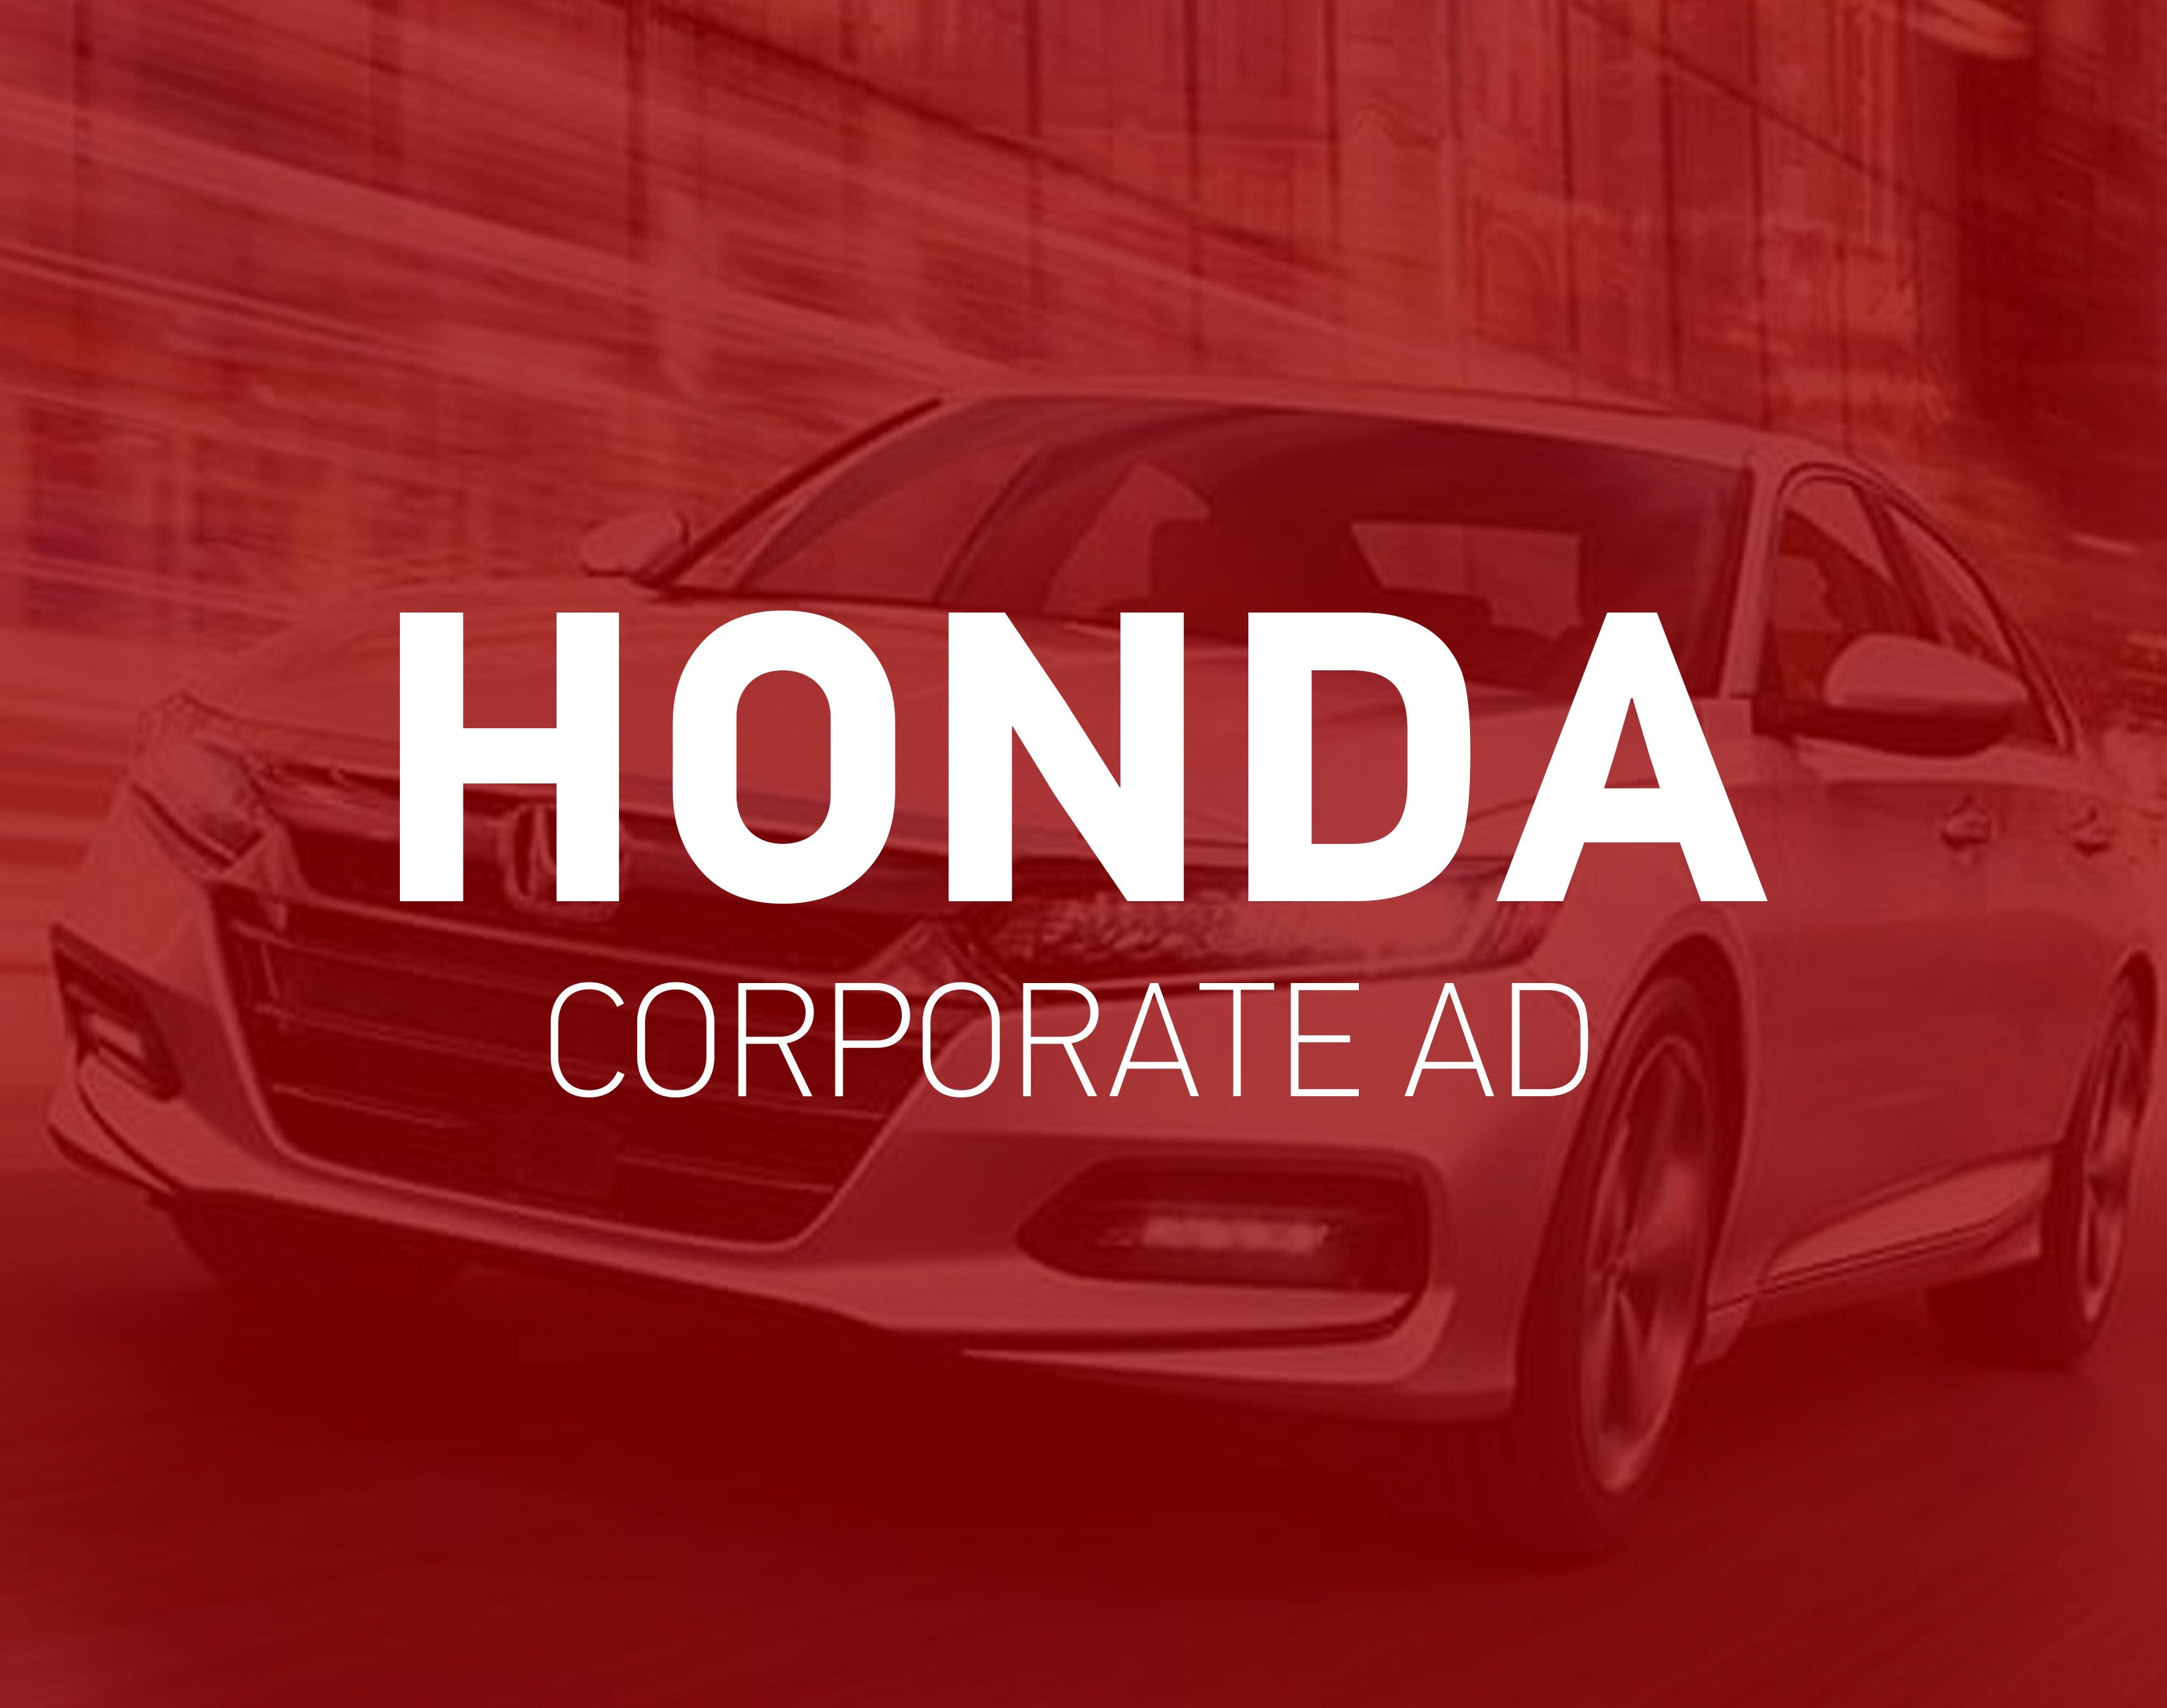 Honda Corporate Ad